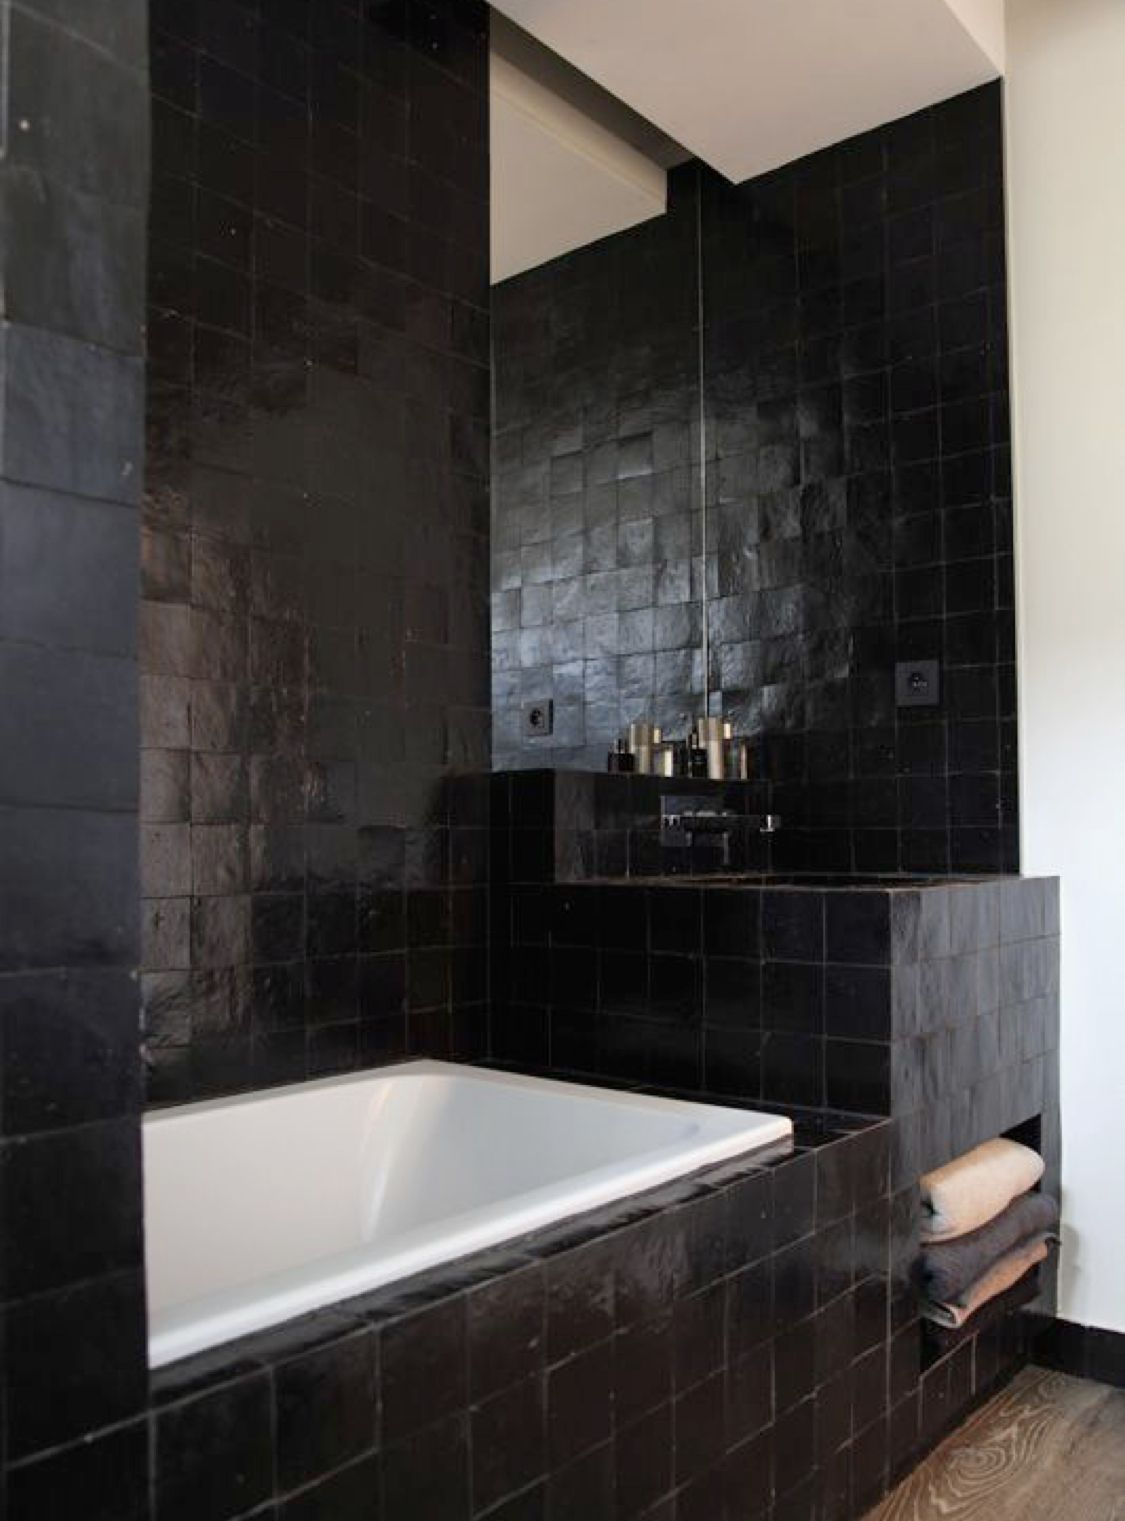 Badkamertegels Zwart Wit.Badkamer Ideeen Badkamertrends Bad Badkamertegels